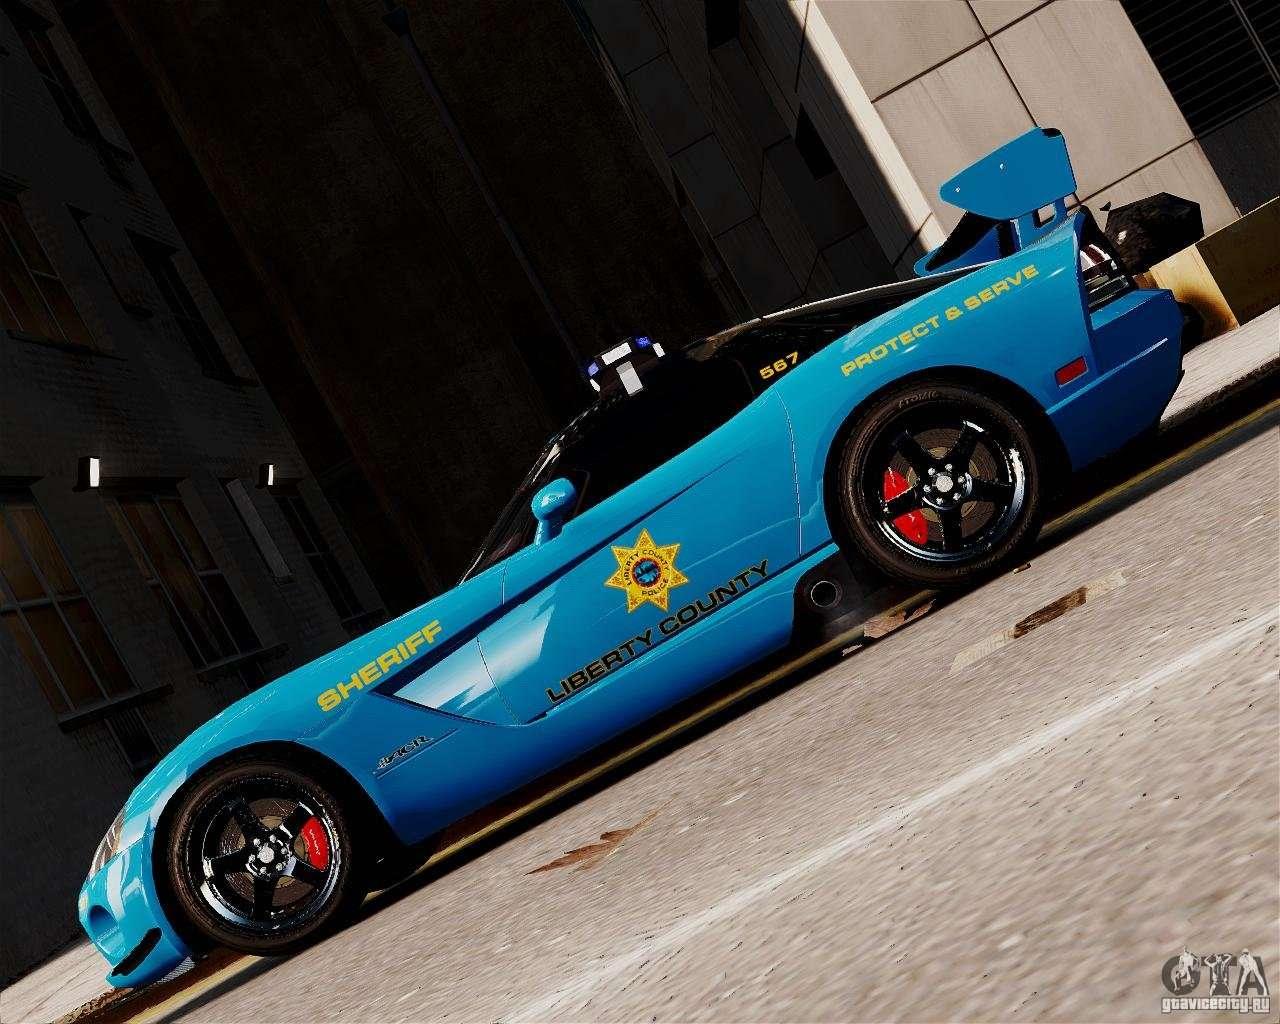 2012 dodge viper test drive upcomingcarshqcom